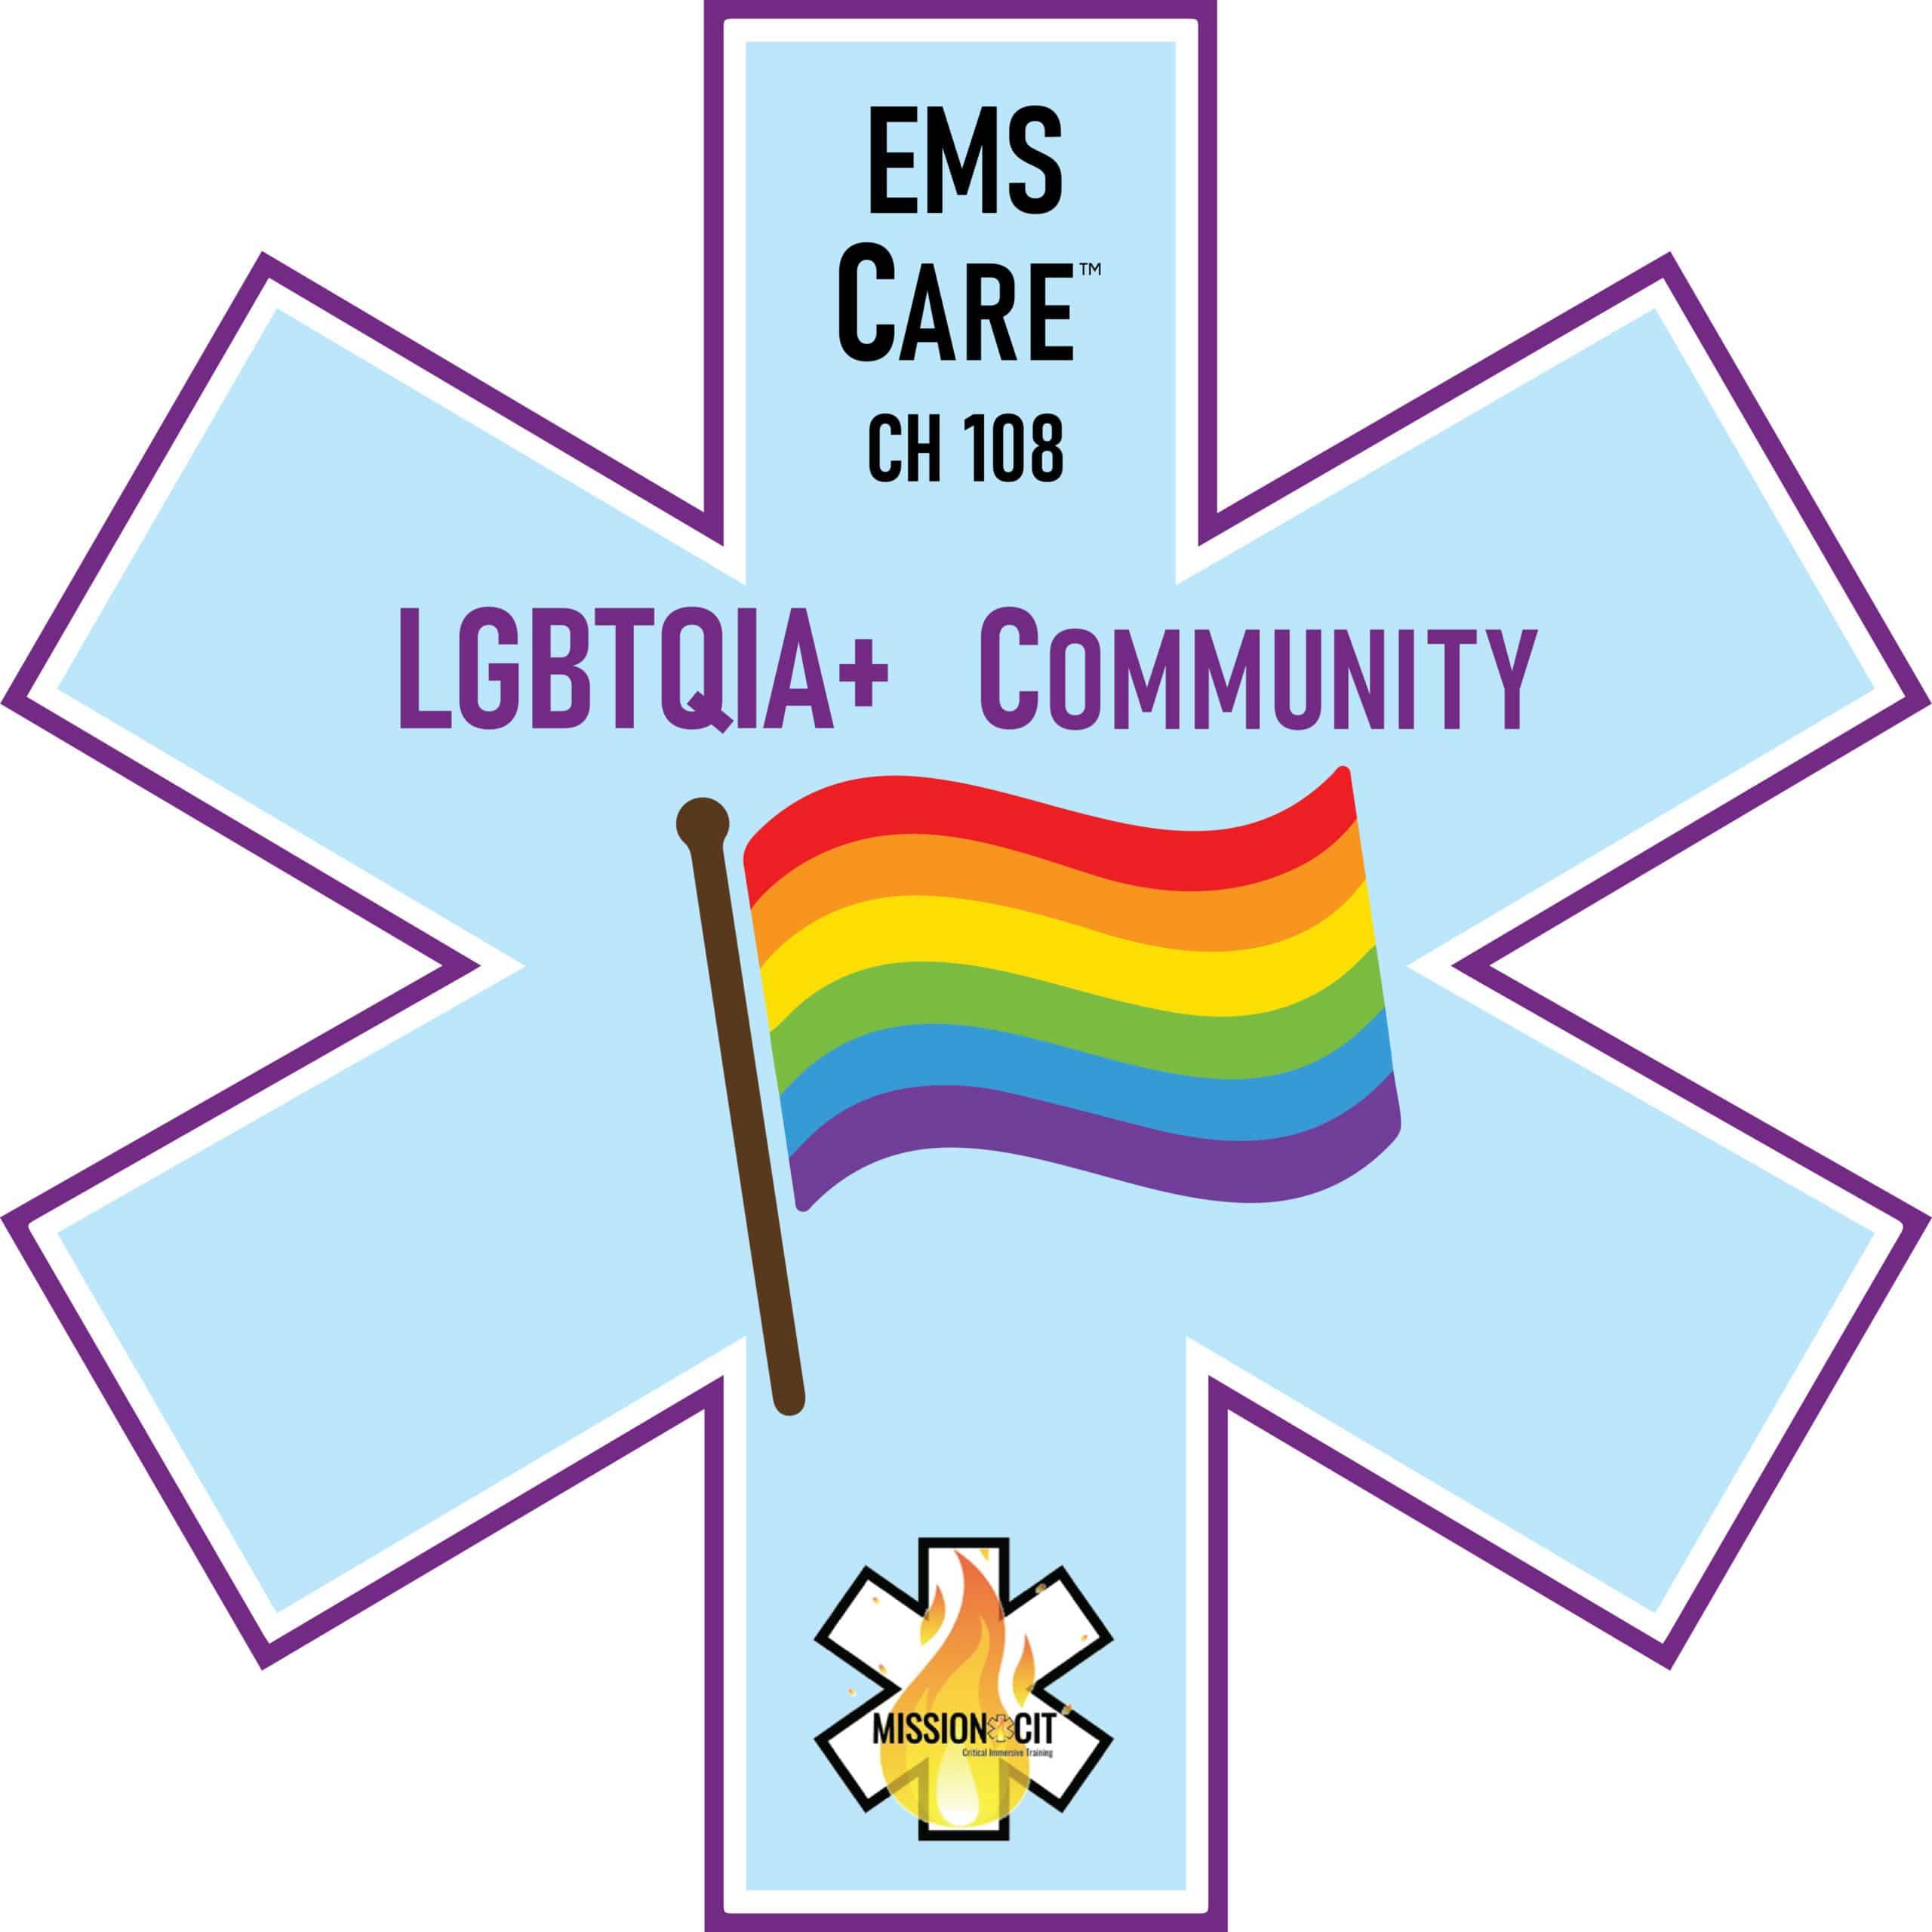 Caring for the LGBTQIA+ Community